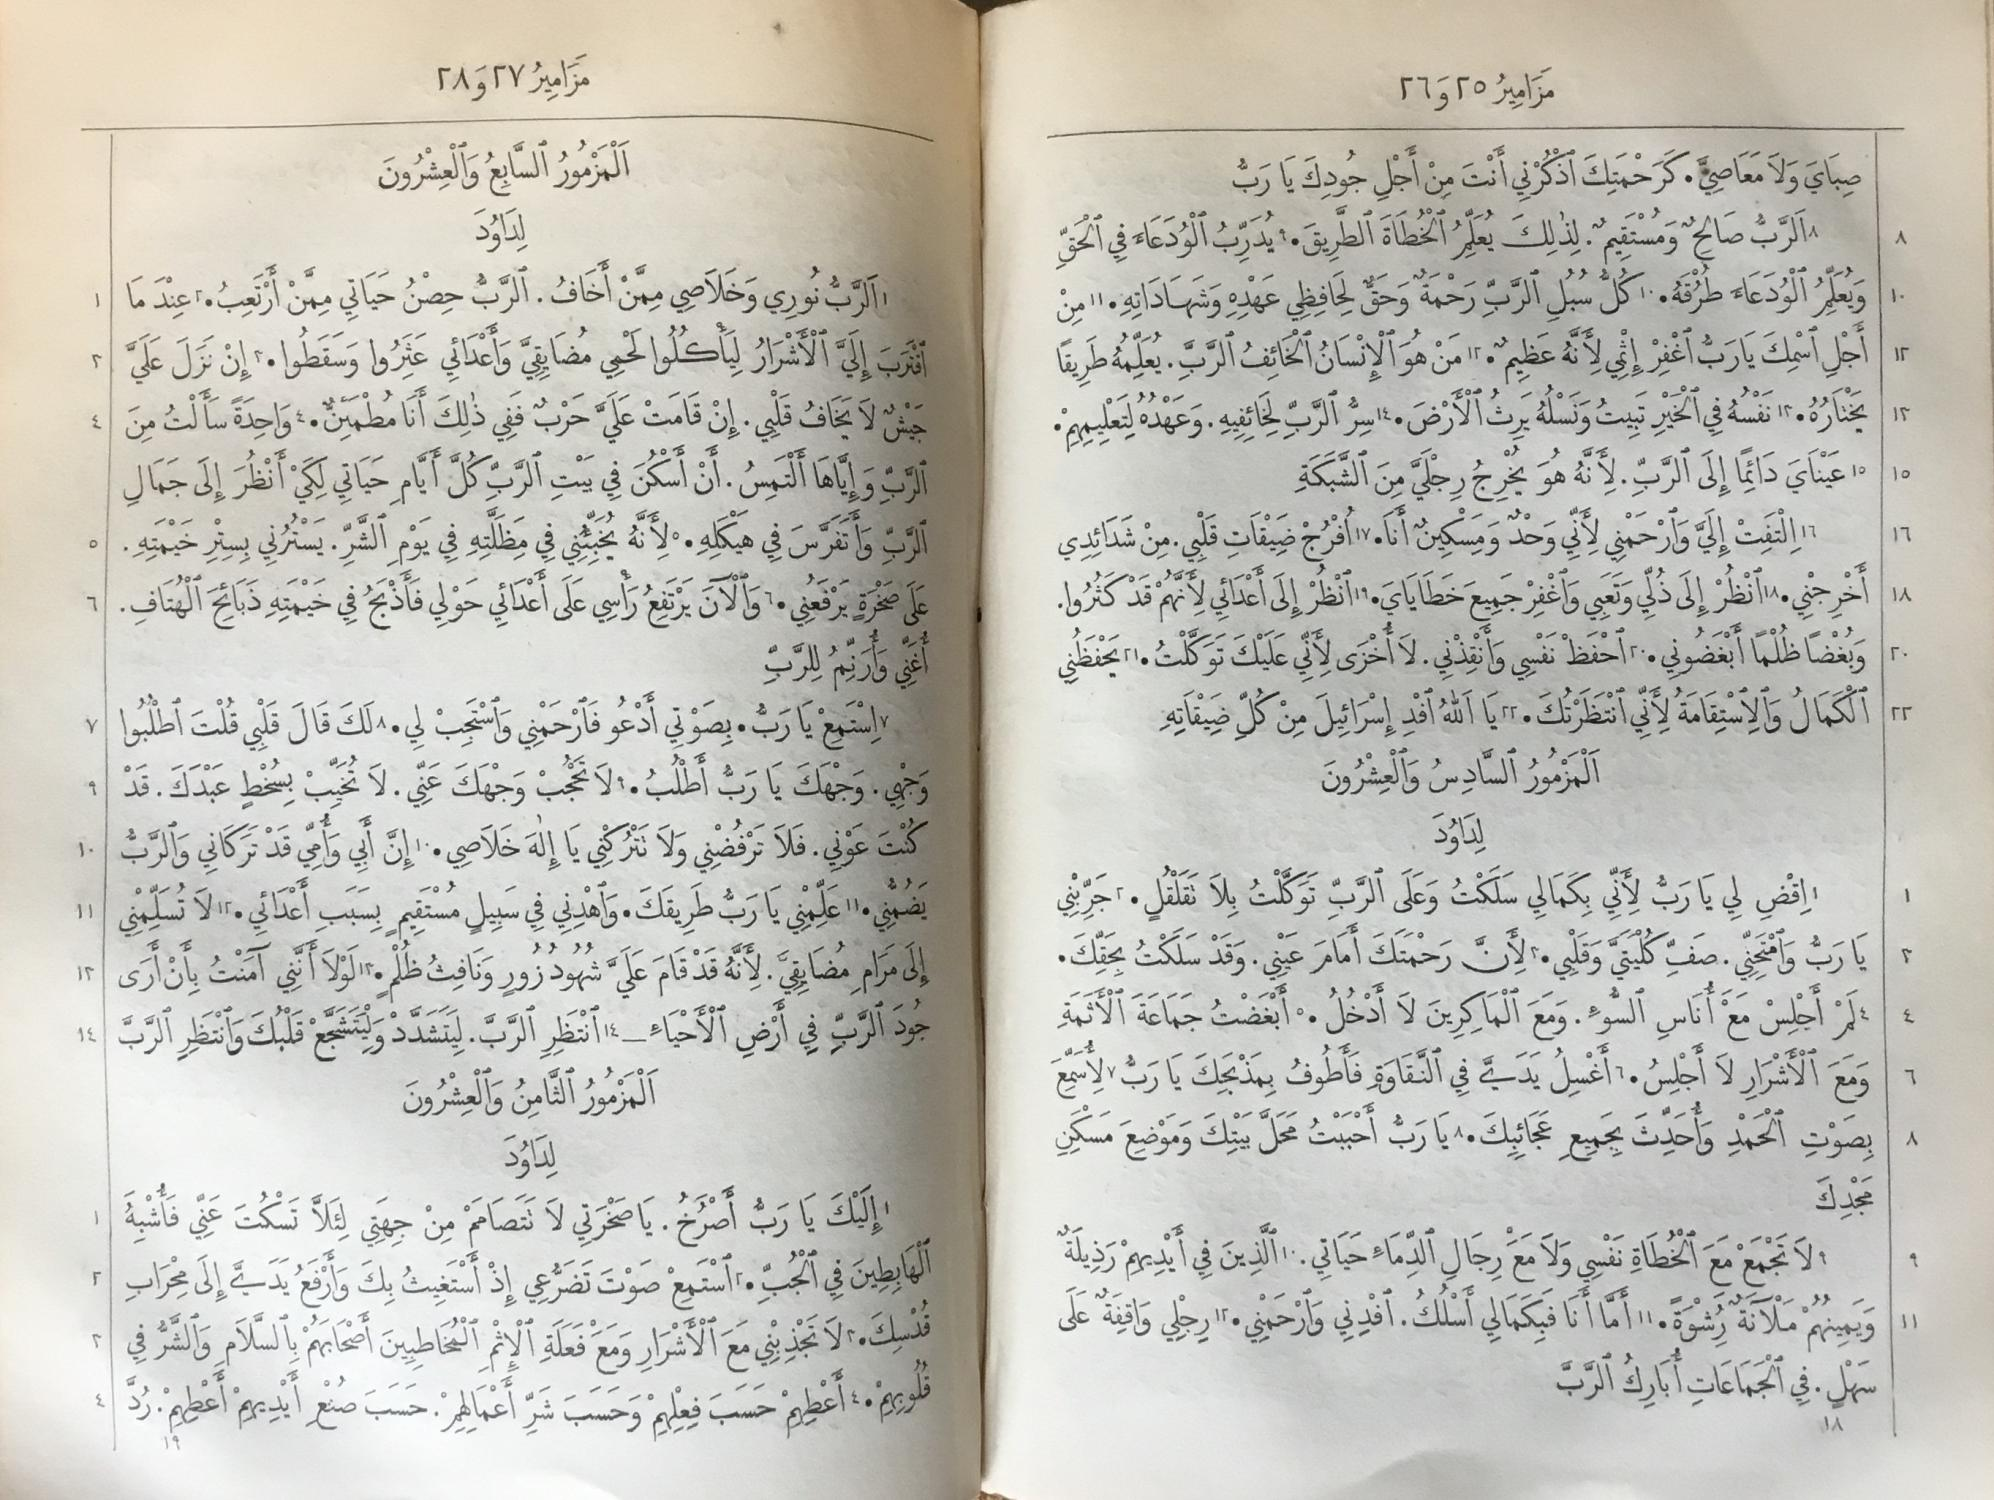 Al-Kitab al-Muqaddas, Ay Kutub al-'Ahd